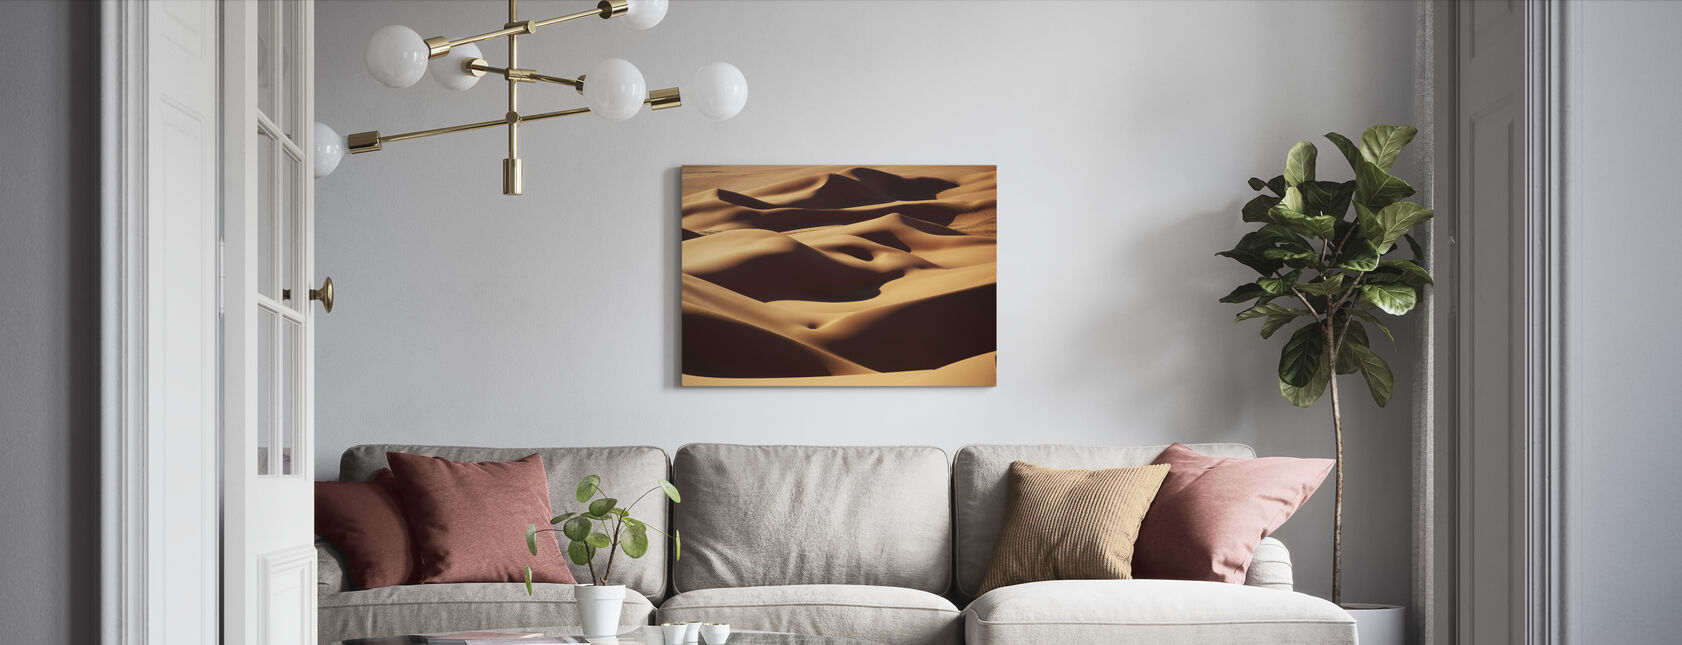 Sand Landskap - Lerretsbilde - Stue